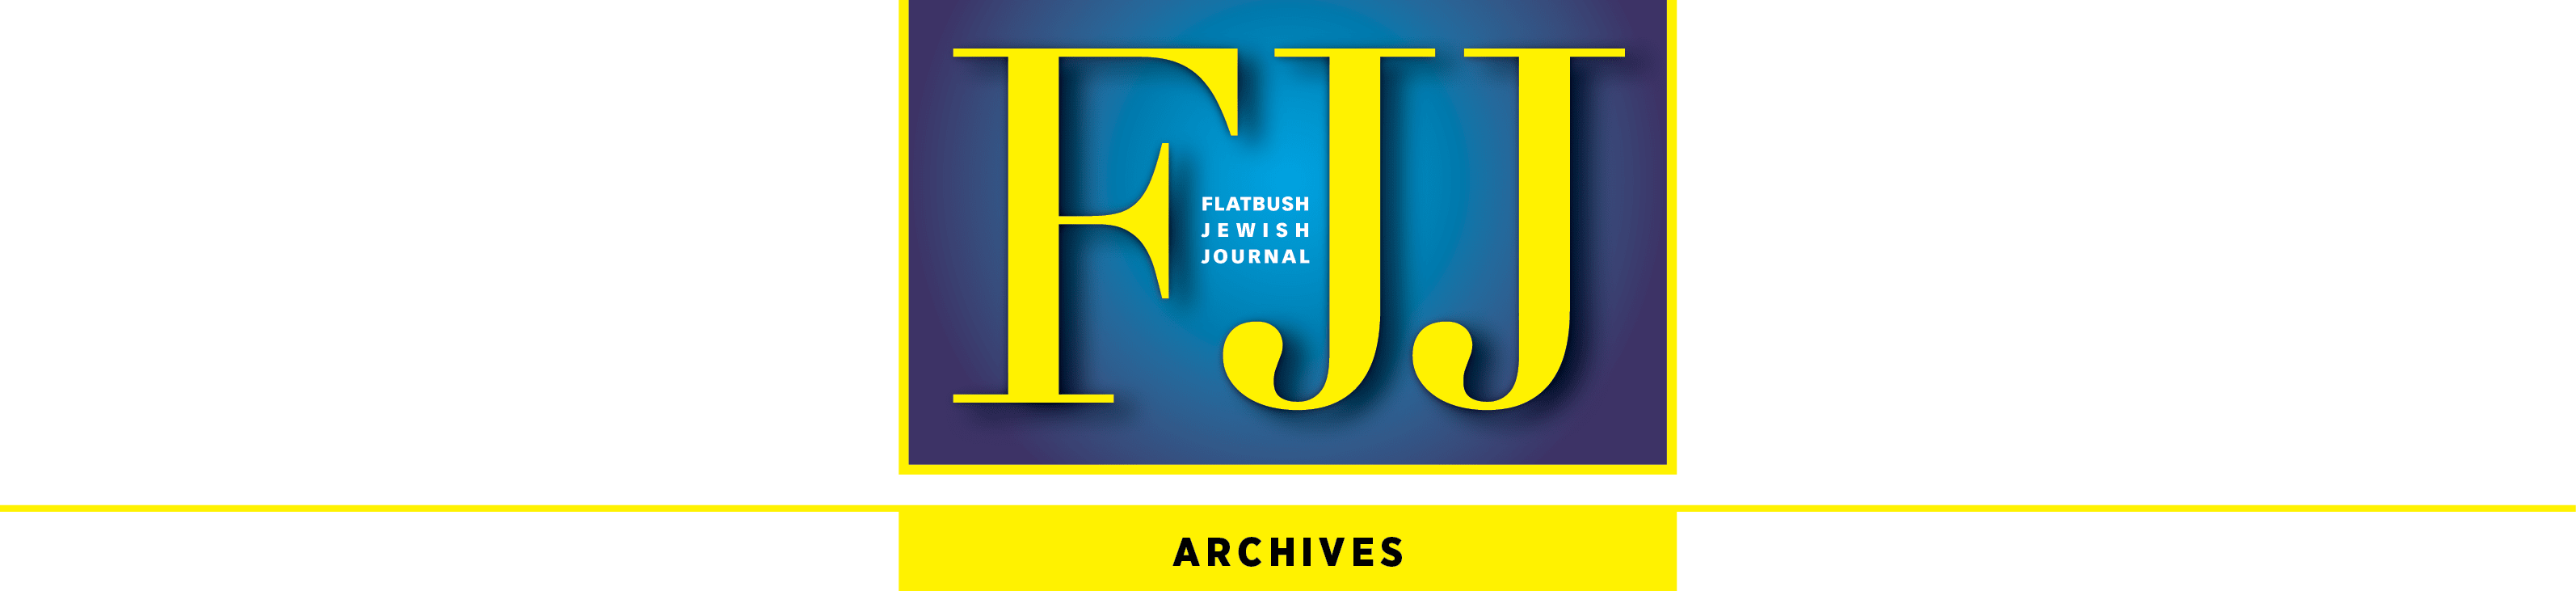 Flatbush Jewish Journal